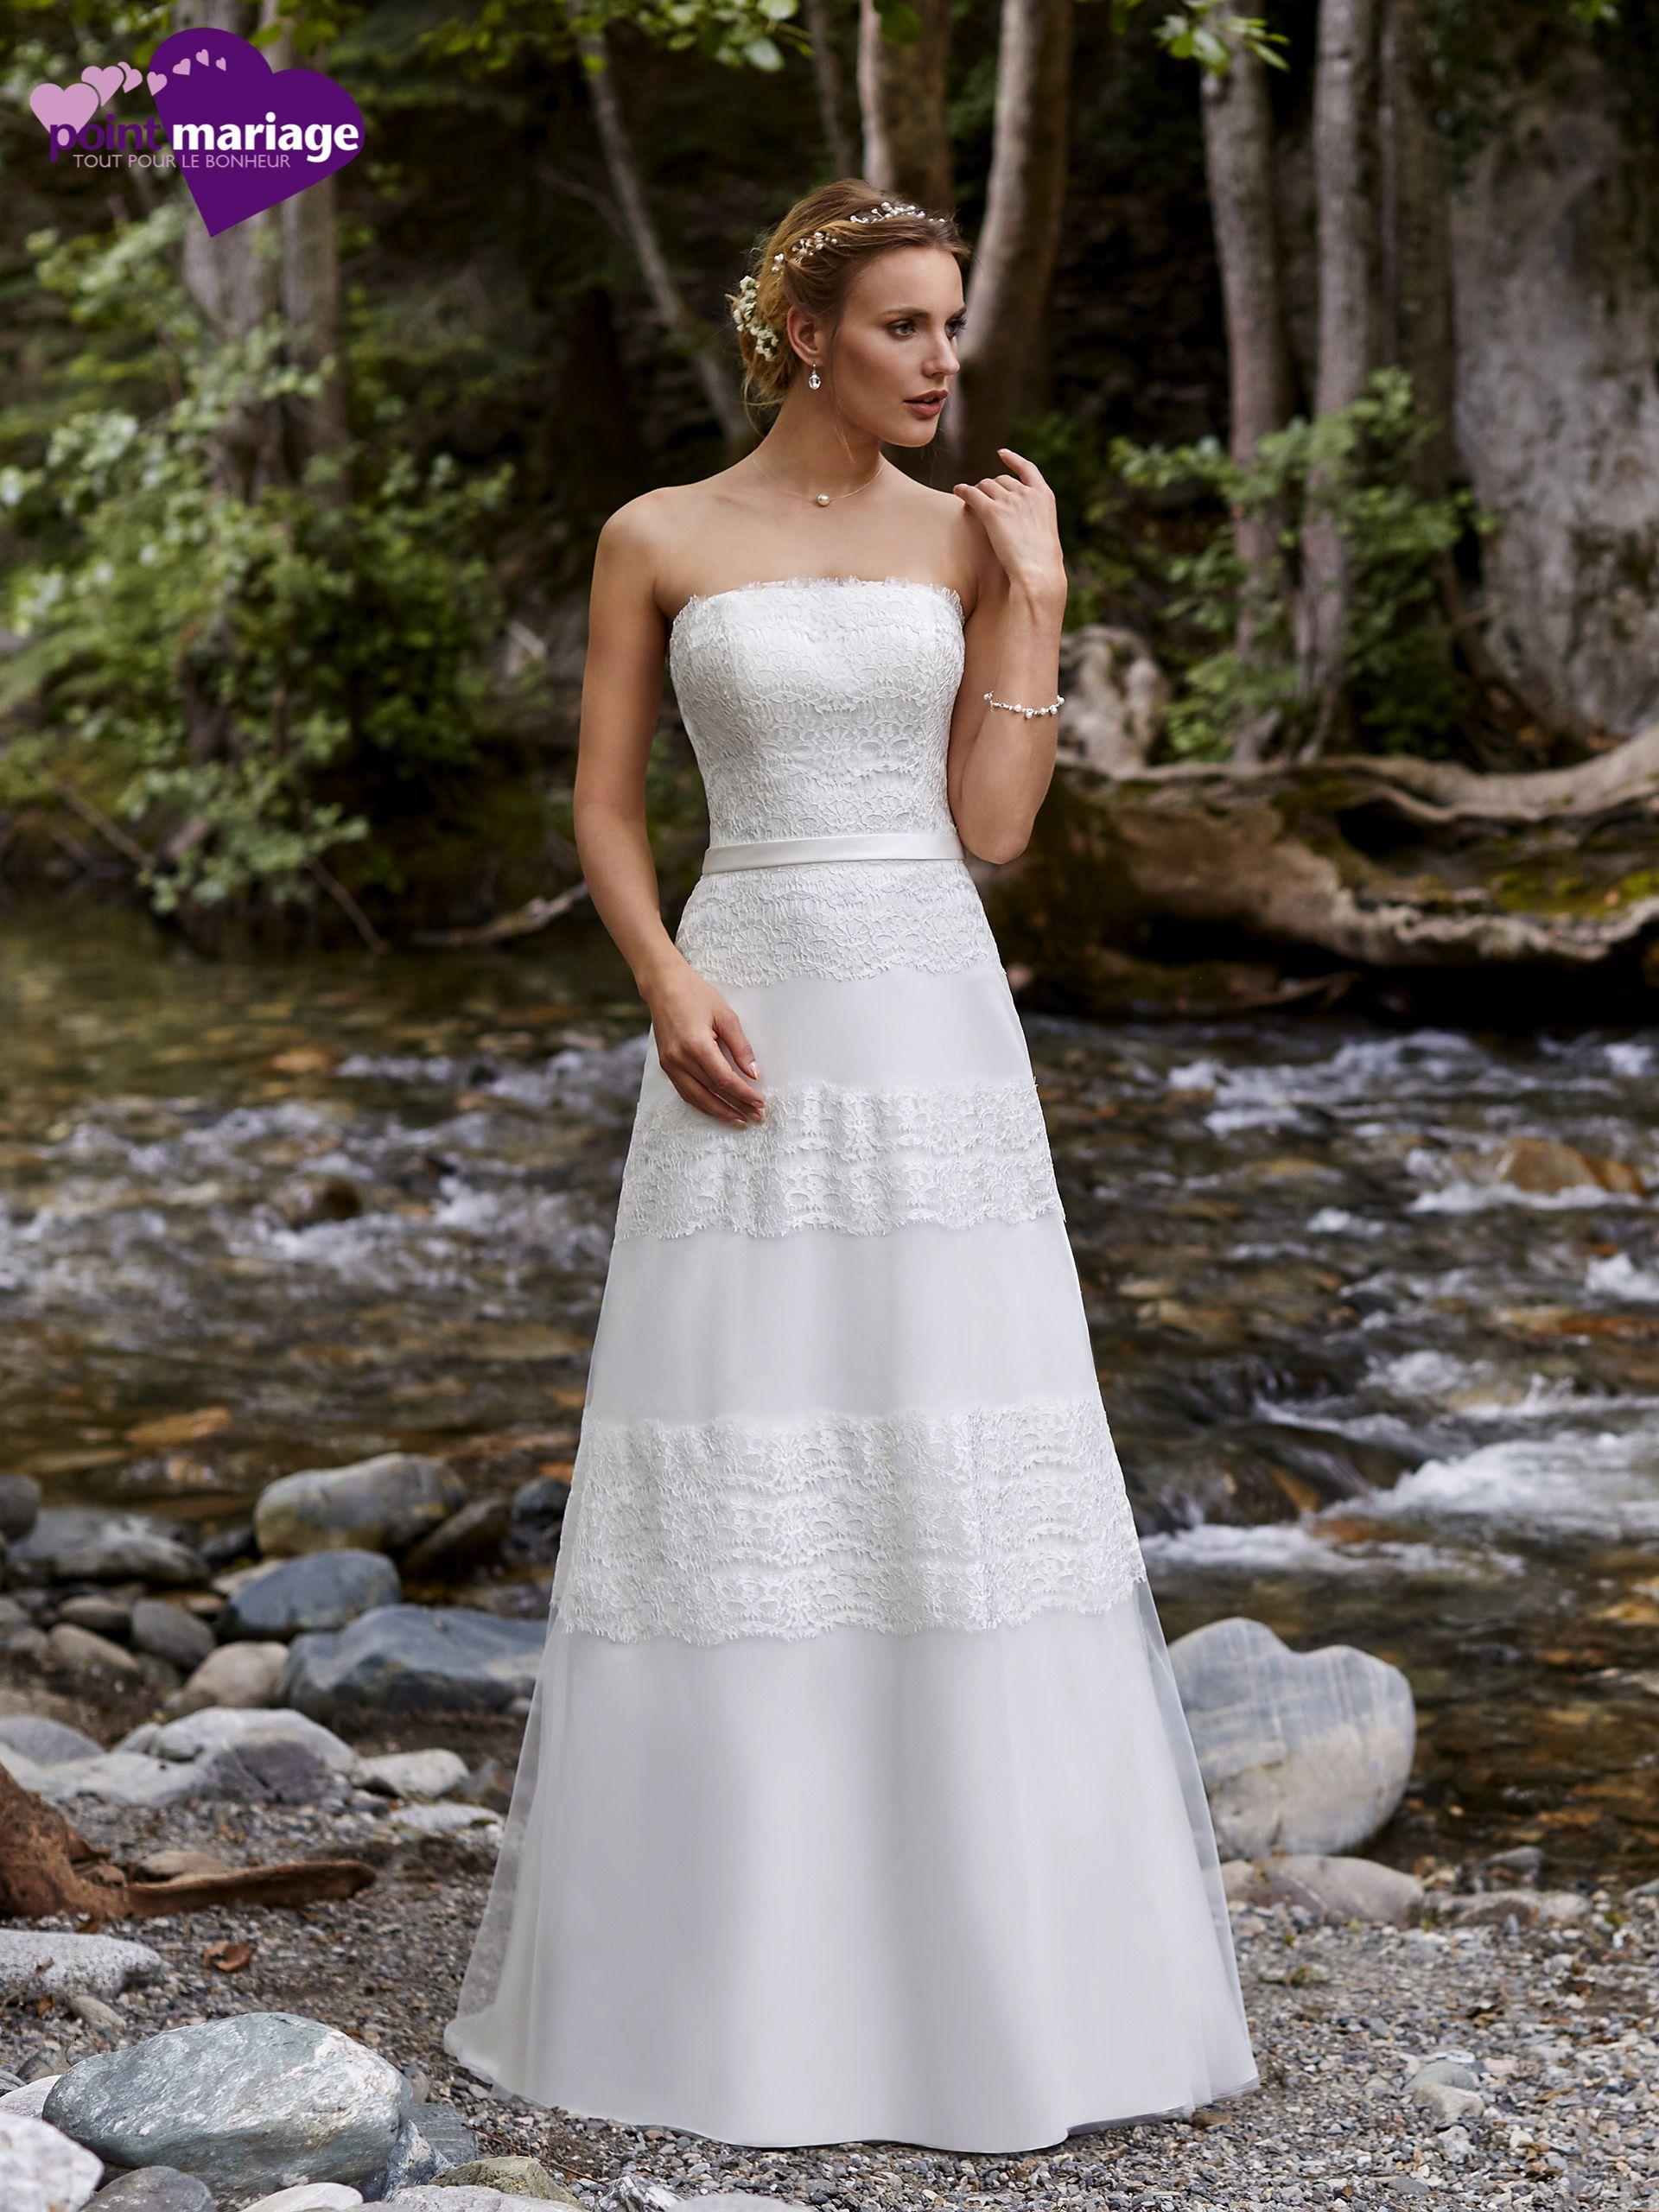 Robe de mariée Valence, robe de mariée bohè